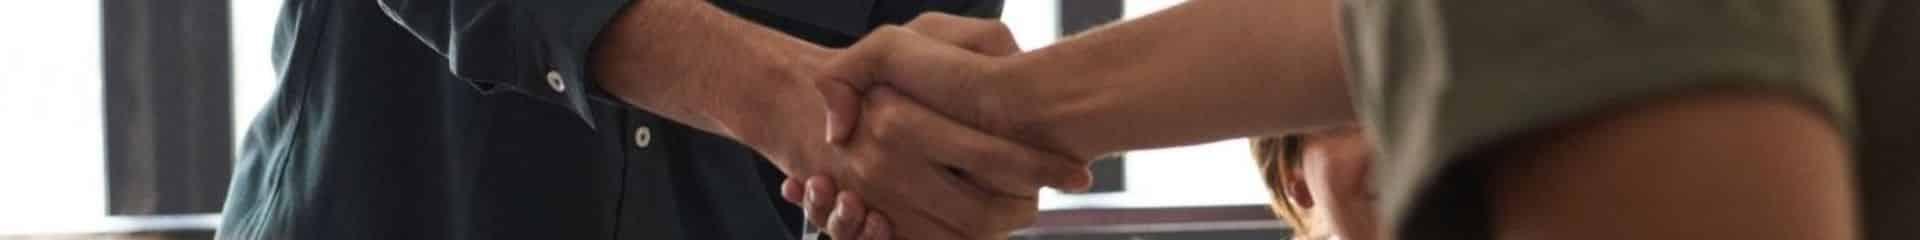 Nos offres - serrer les mains